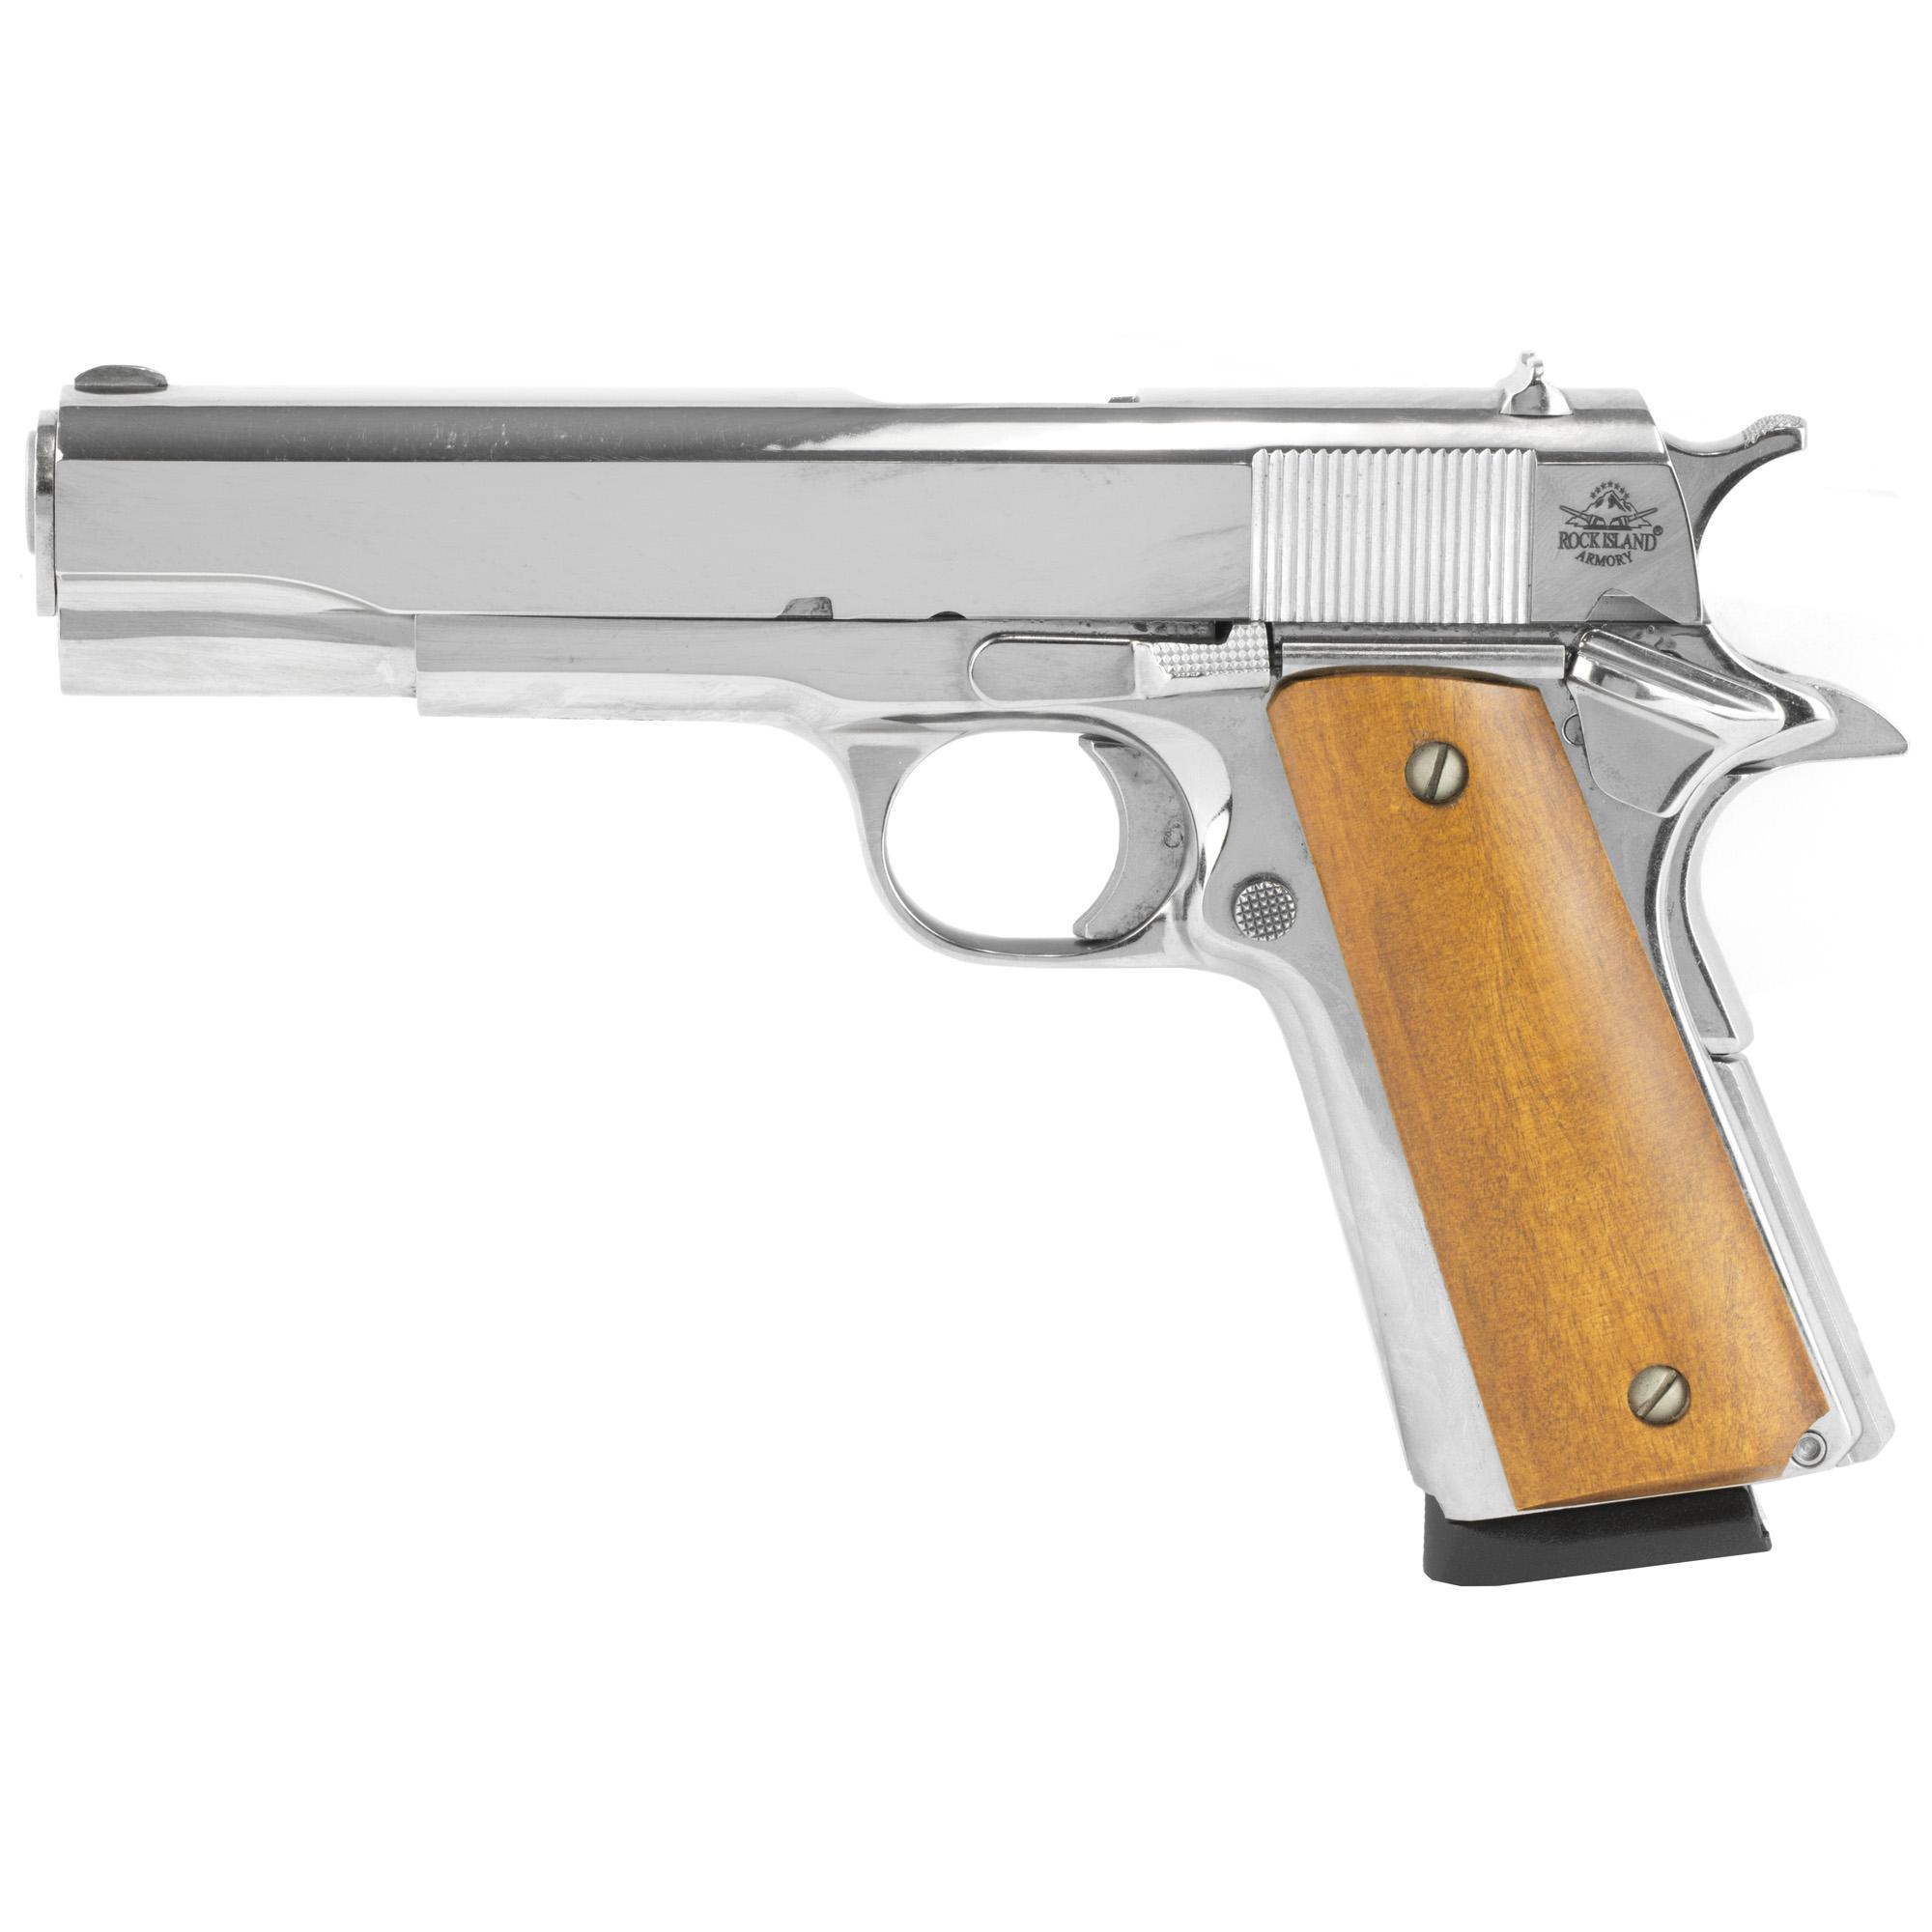 Armscor GI Series Standard FS 1911 5